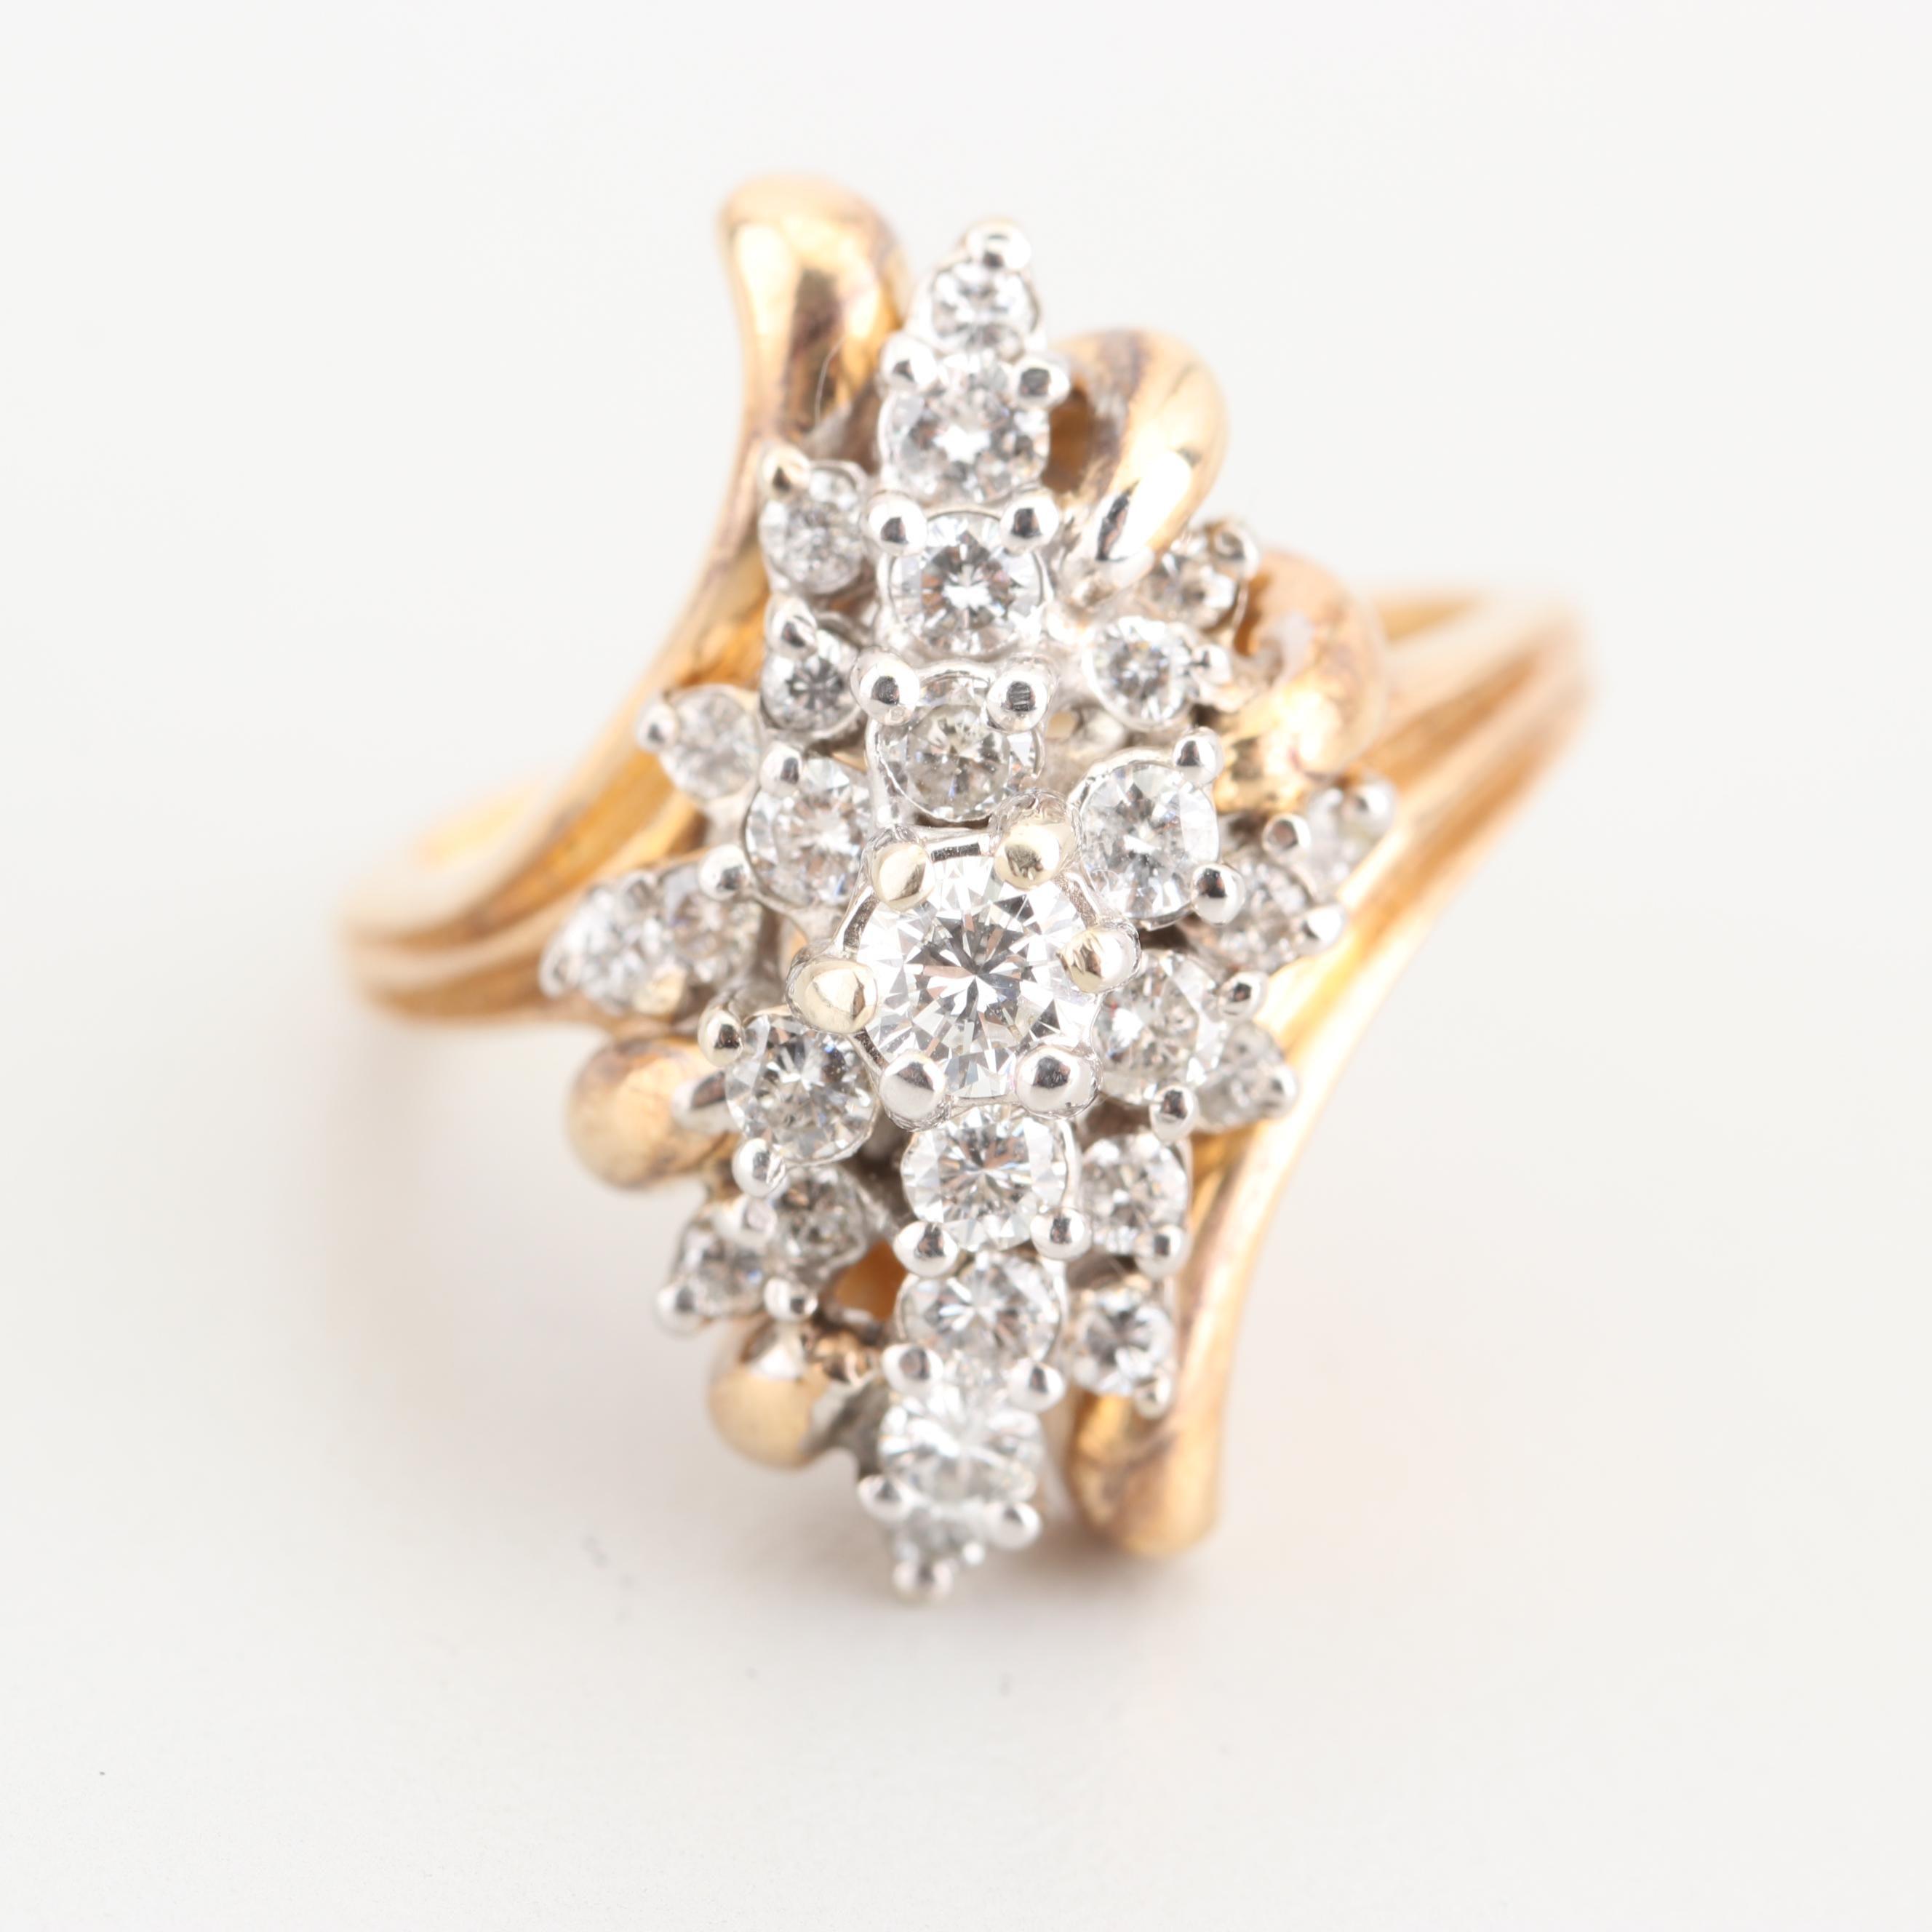 14K Yellow Gold 1.20 CTW Diamond Ring